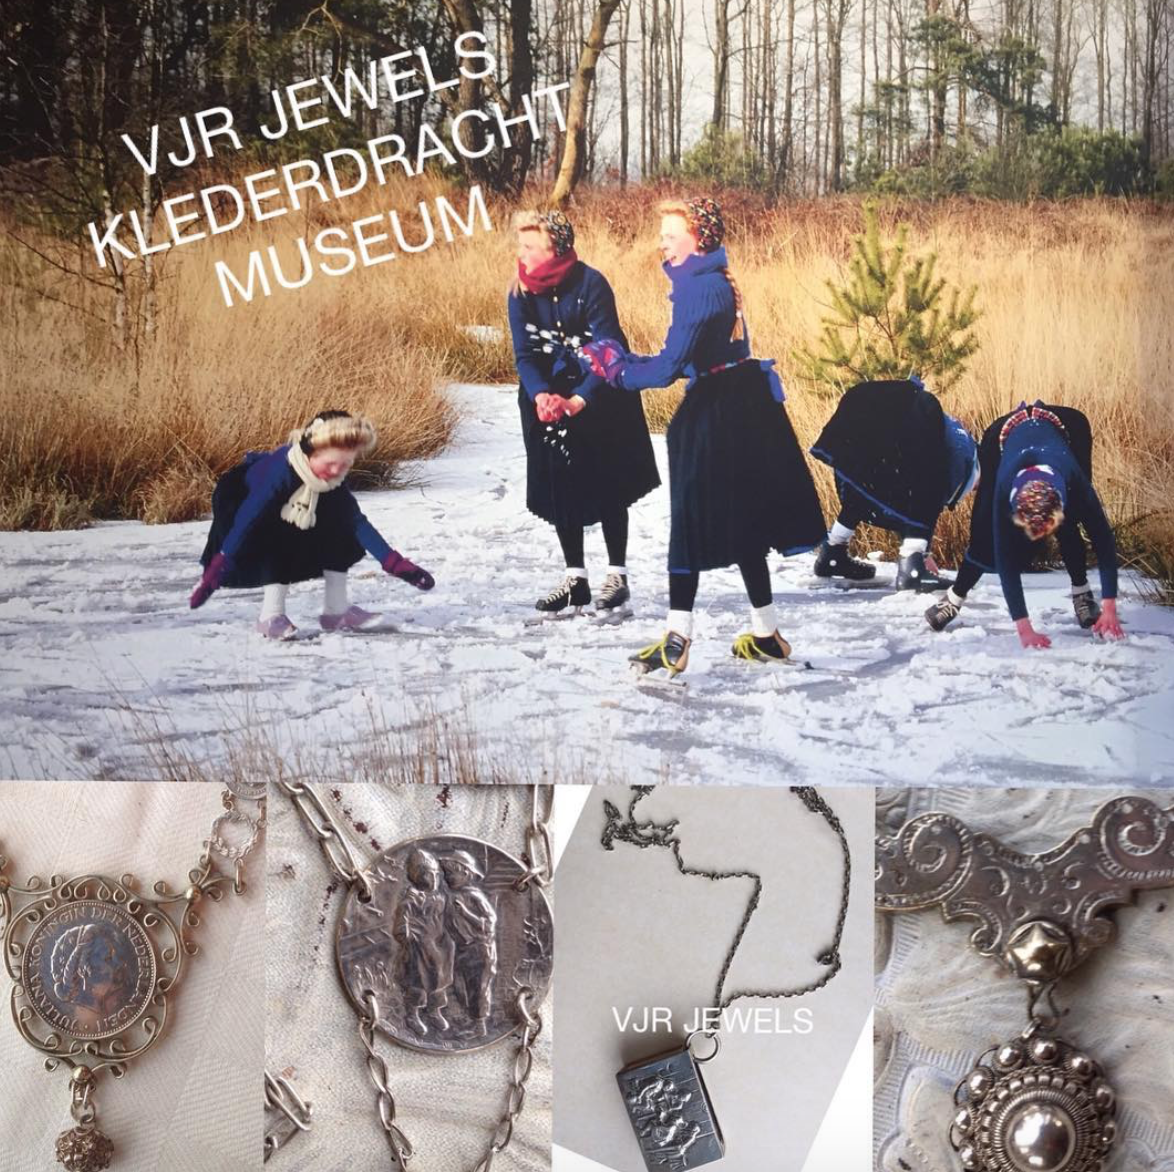 New VJR Jewels sellingpoint @Klederdrachtmuseum